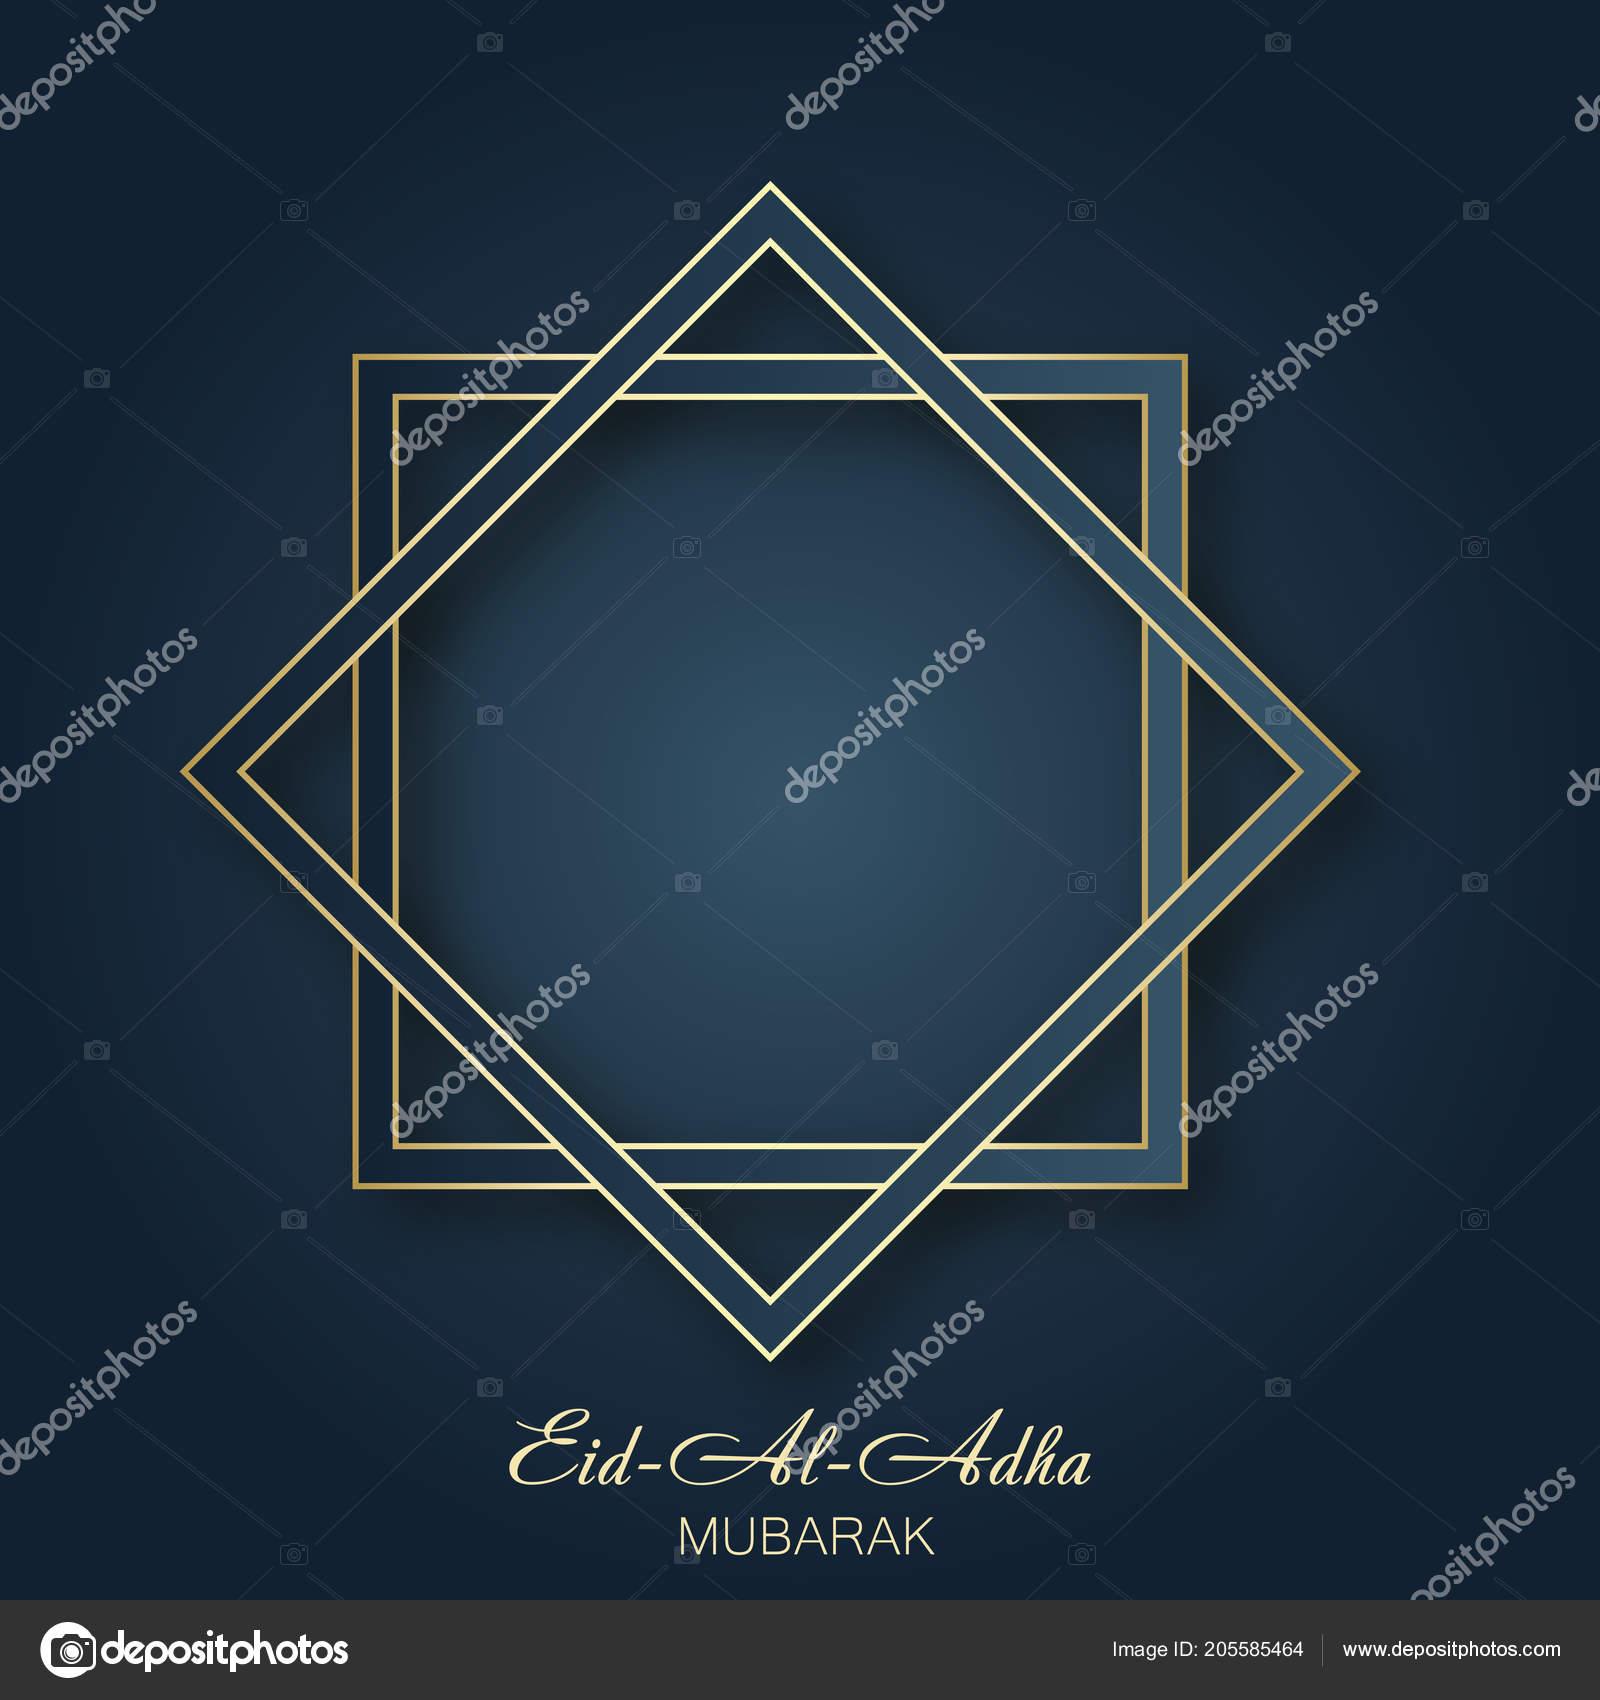 Eid Al Adha Mubarak Greeting Card With Arabic Ornaments Vector